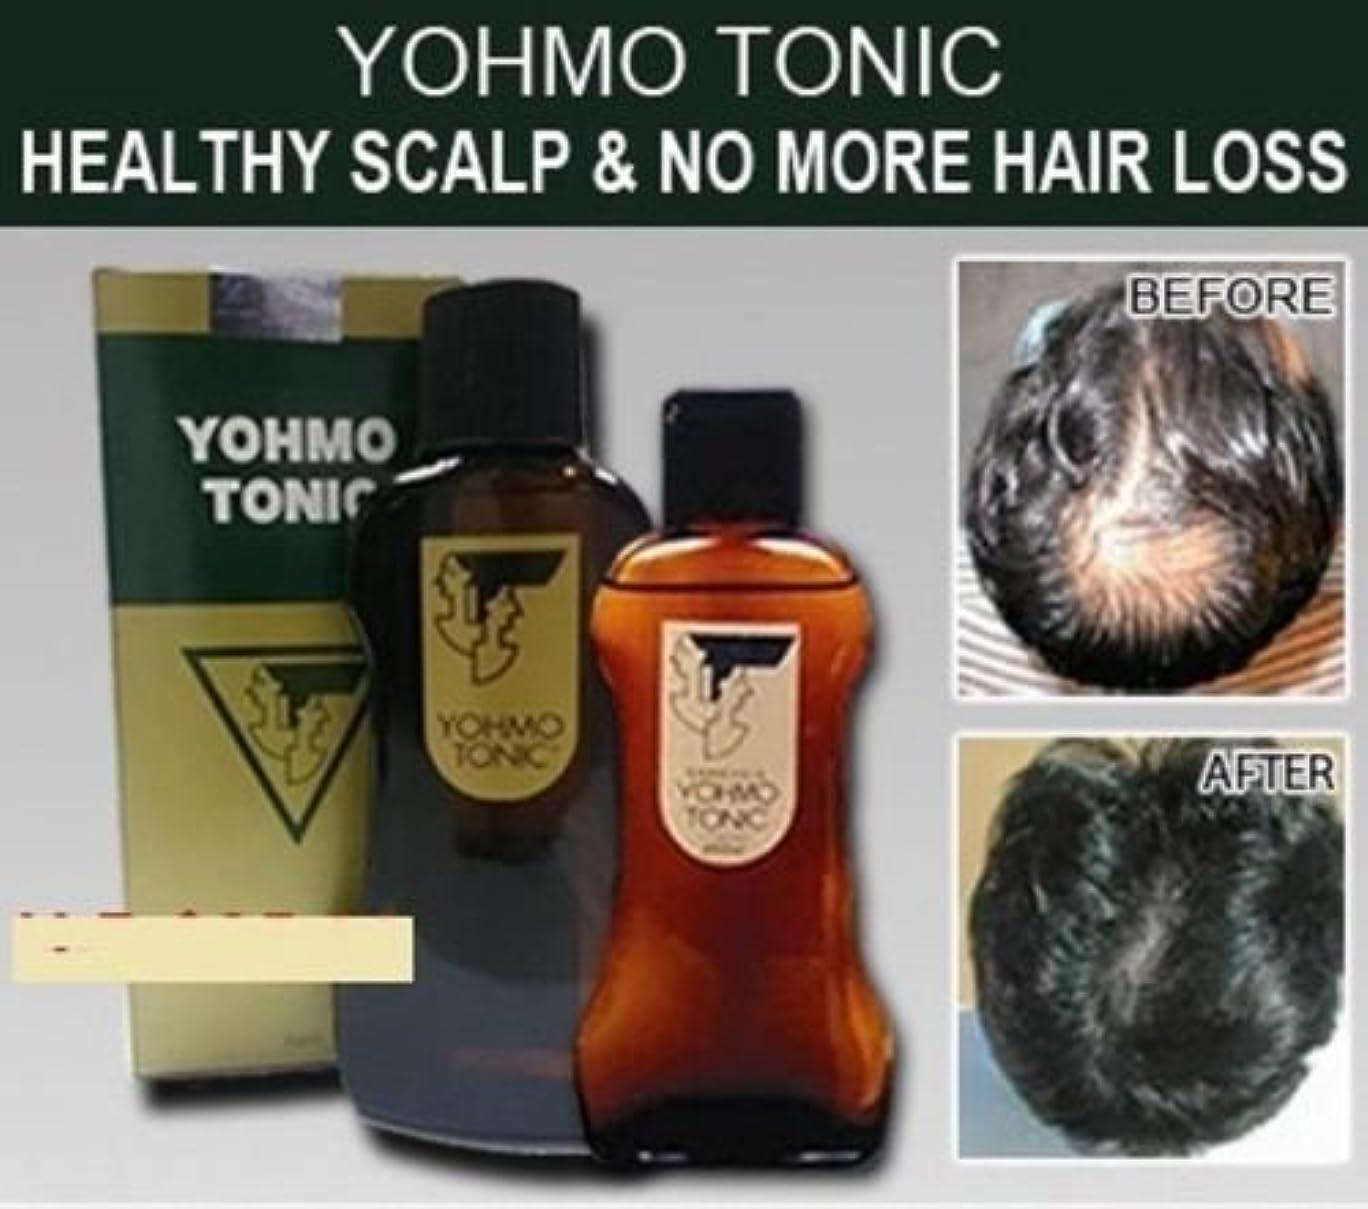 報酬の自由船尾YOHMO 強壮剤200ml 使用する育毛剤外部日本脱毛強壮剤